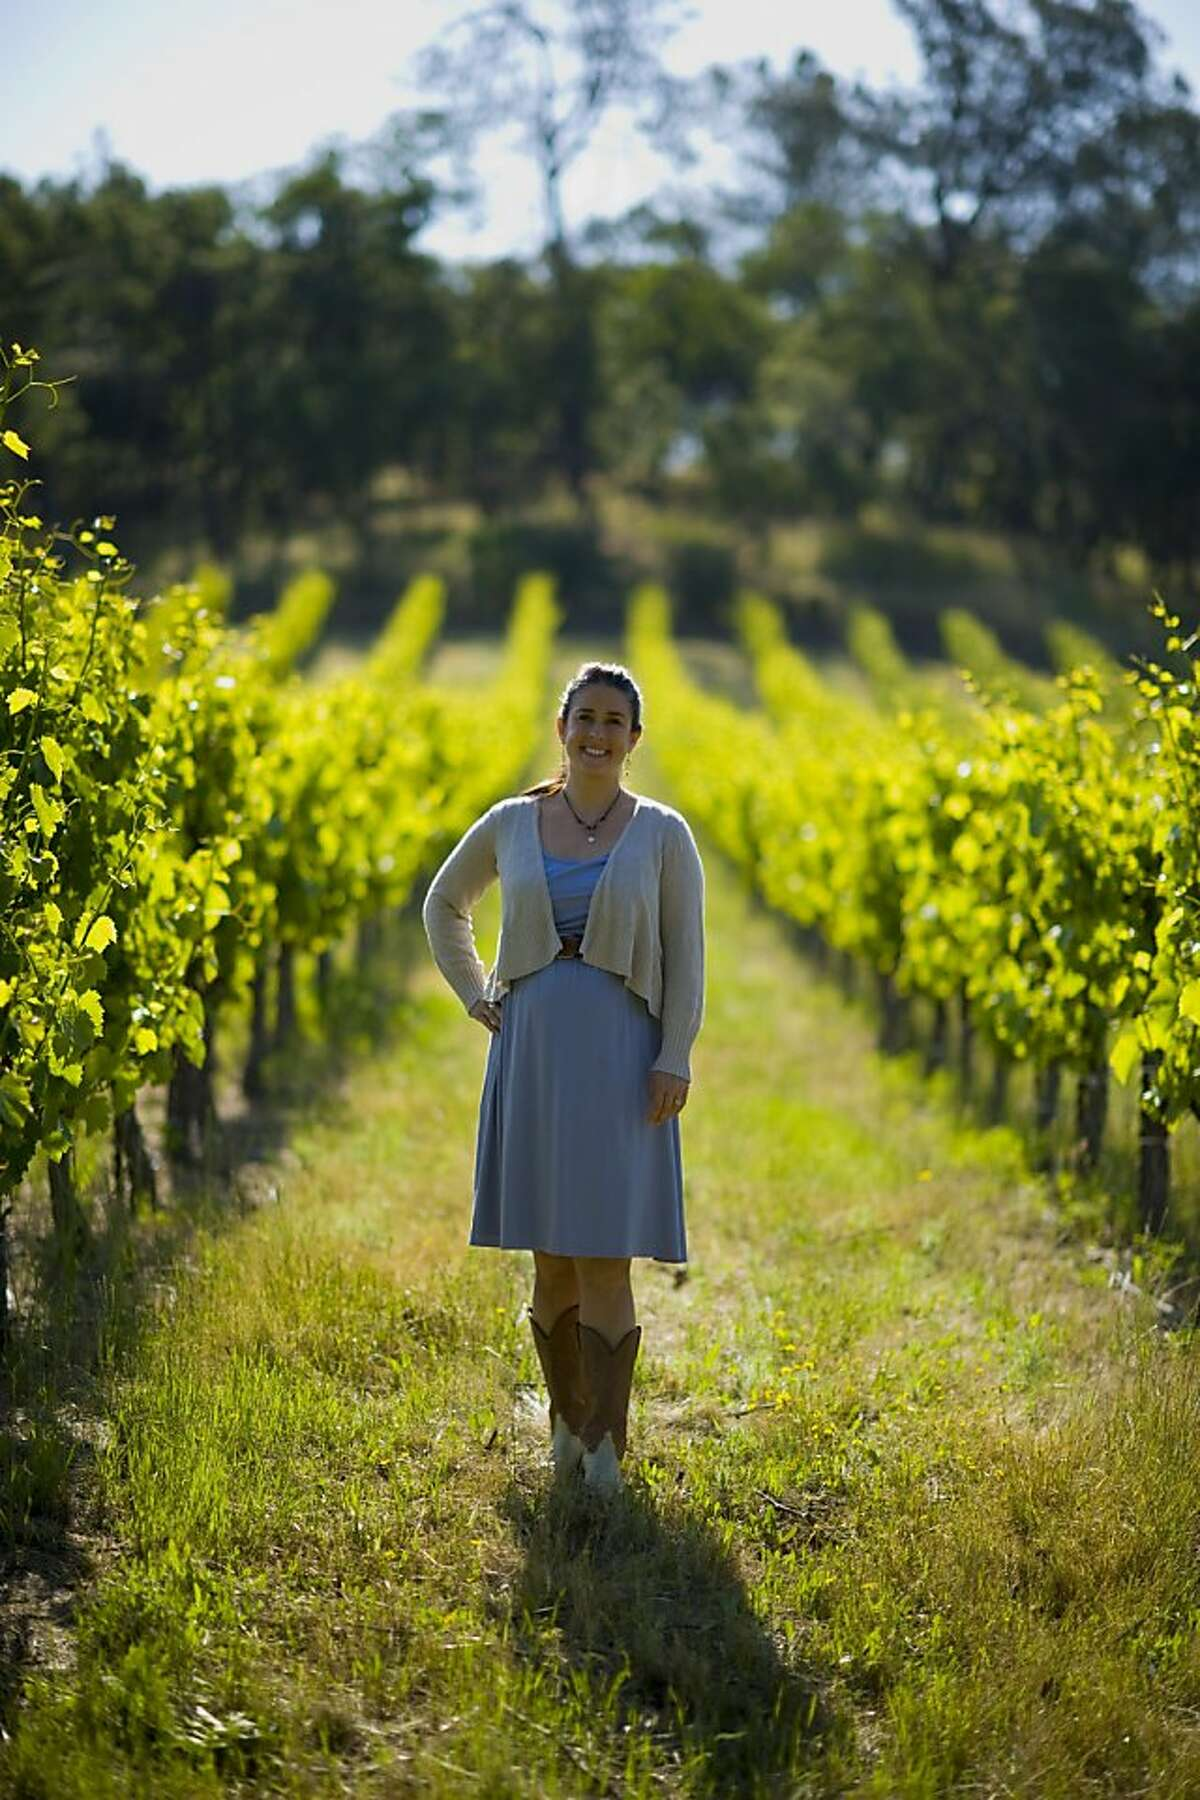 David Girard Vineyards winemaker Mari Wells Coyle in the vineyards of the winery where she works.